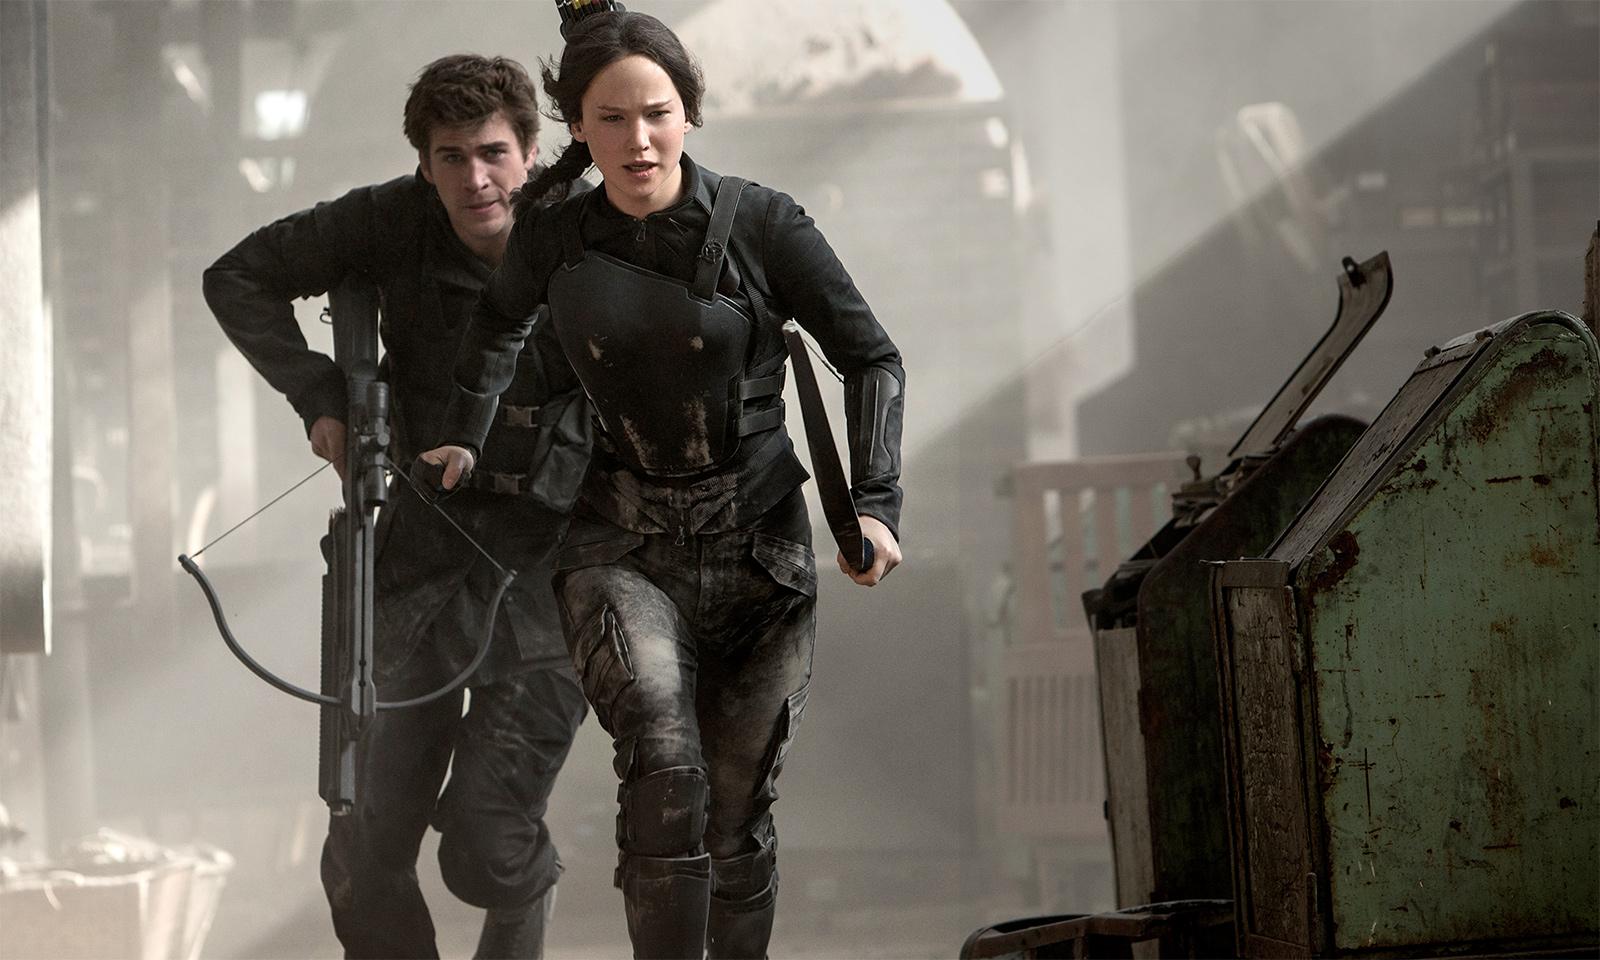 The Hunger Games: Mockingjay Part 1 Promotionals & Stills